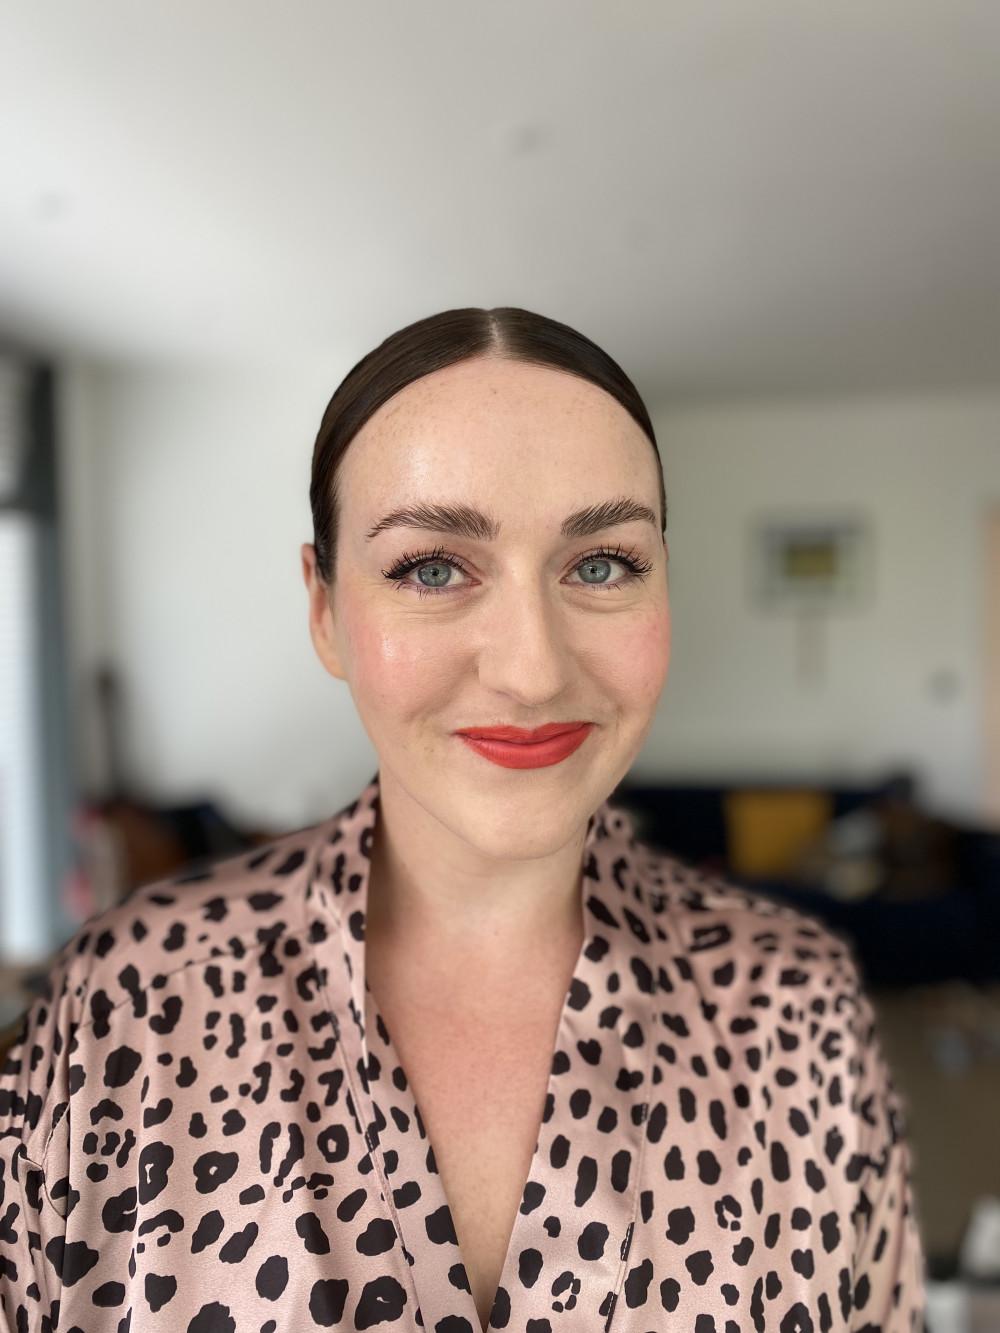 Natural makeup with a twist - Make Me Bridal Artist: Flaming Bride. #classic #glamorous #naturalmakeup #redlip #eyeliner #dewyskin #glowingskin #orangelip #naturalskin #neon